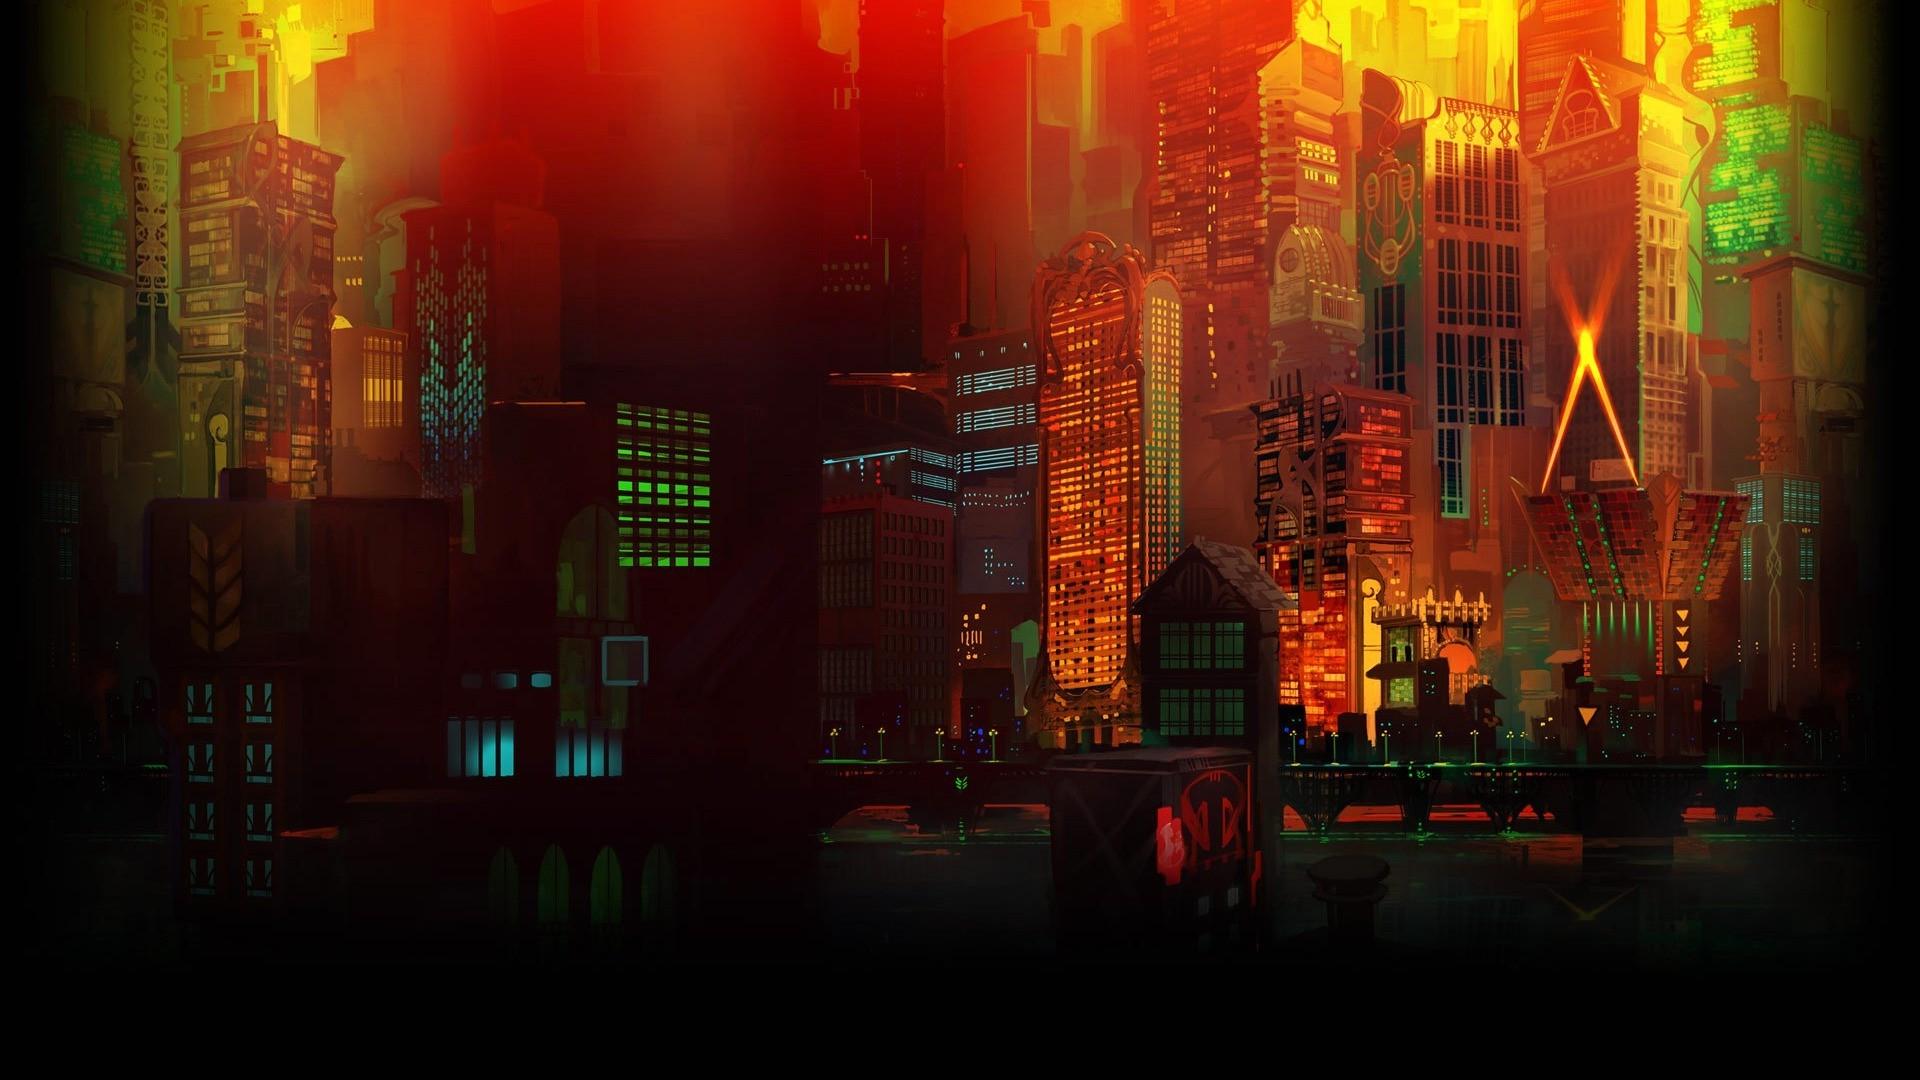 1920x1080 px 3D building CGI colorful digital art lights skyscraper Transistor video games window